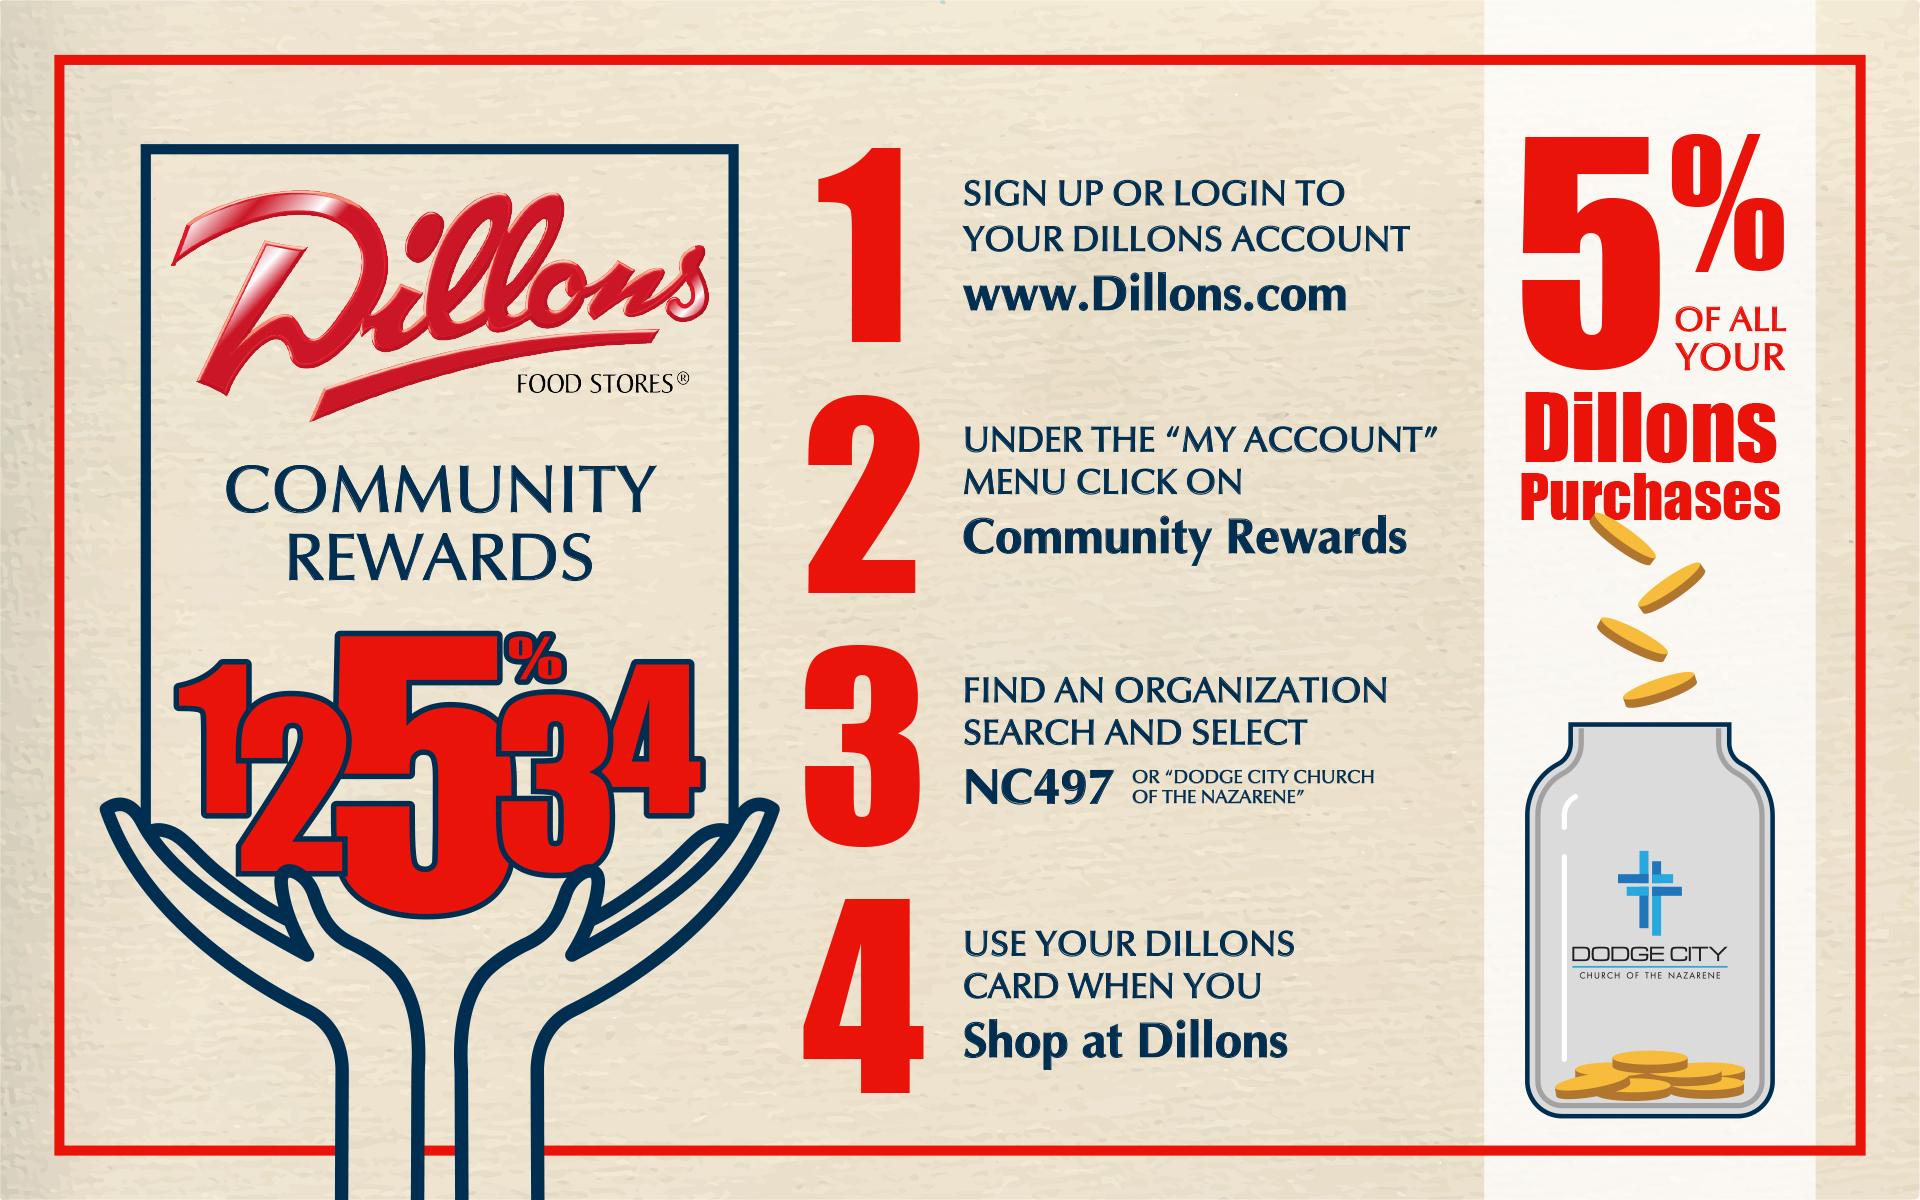 Dillons Community Rewards 1920x1200 slide.jpg